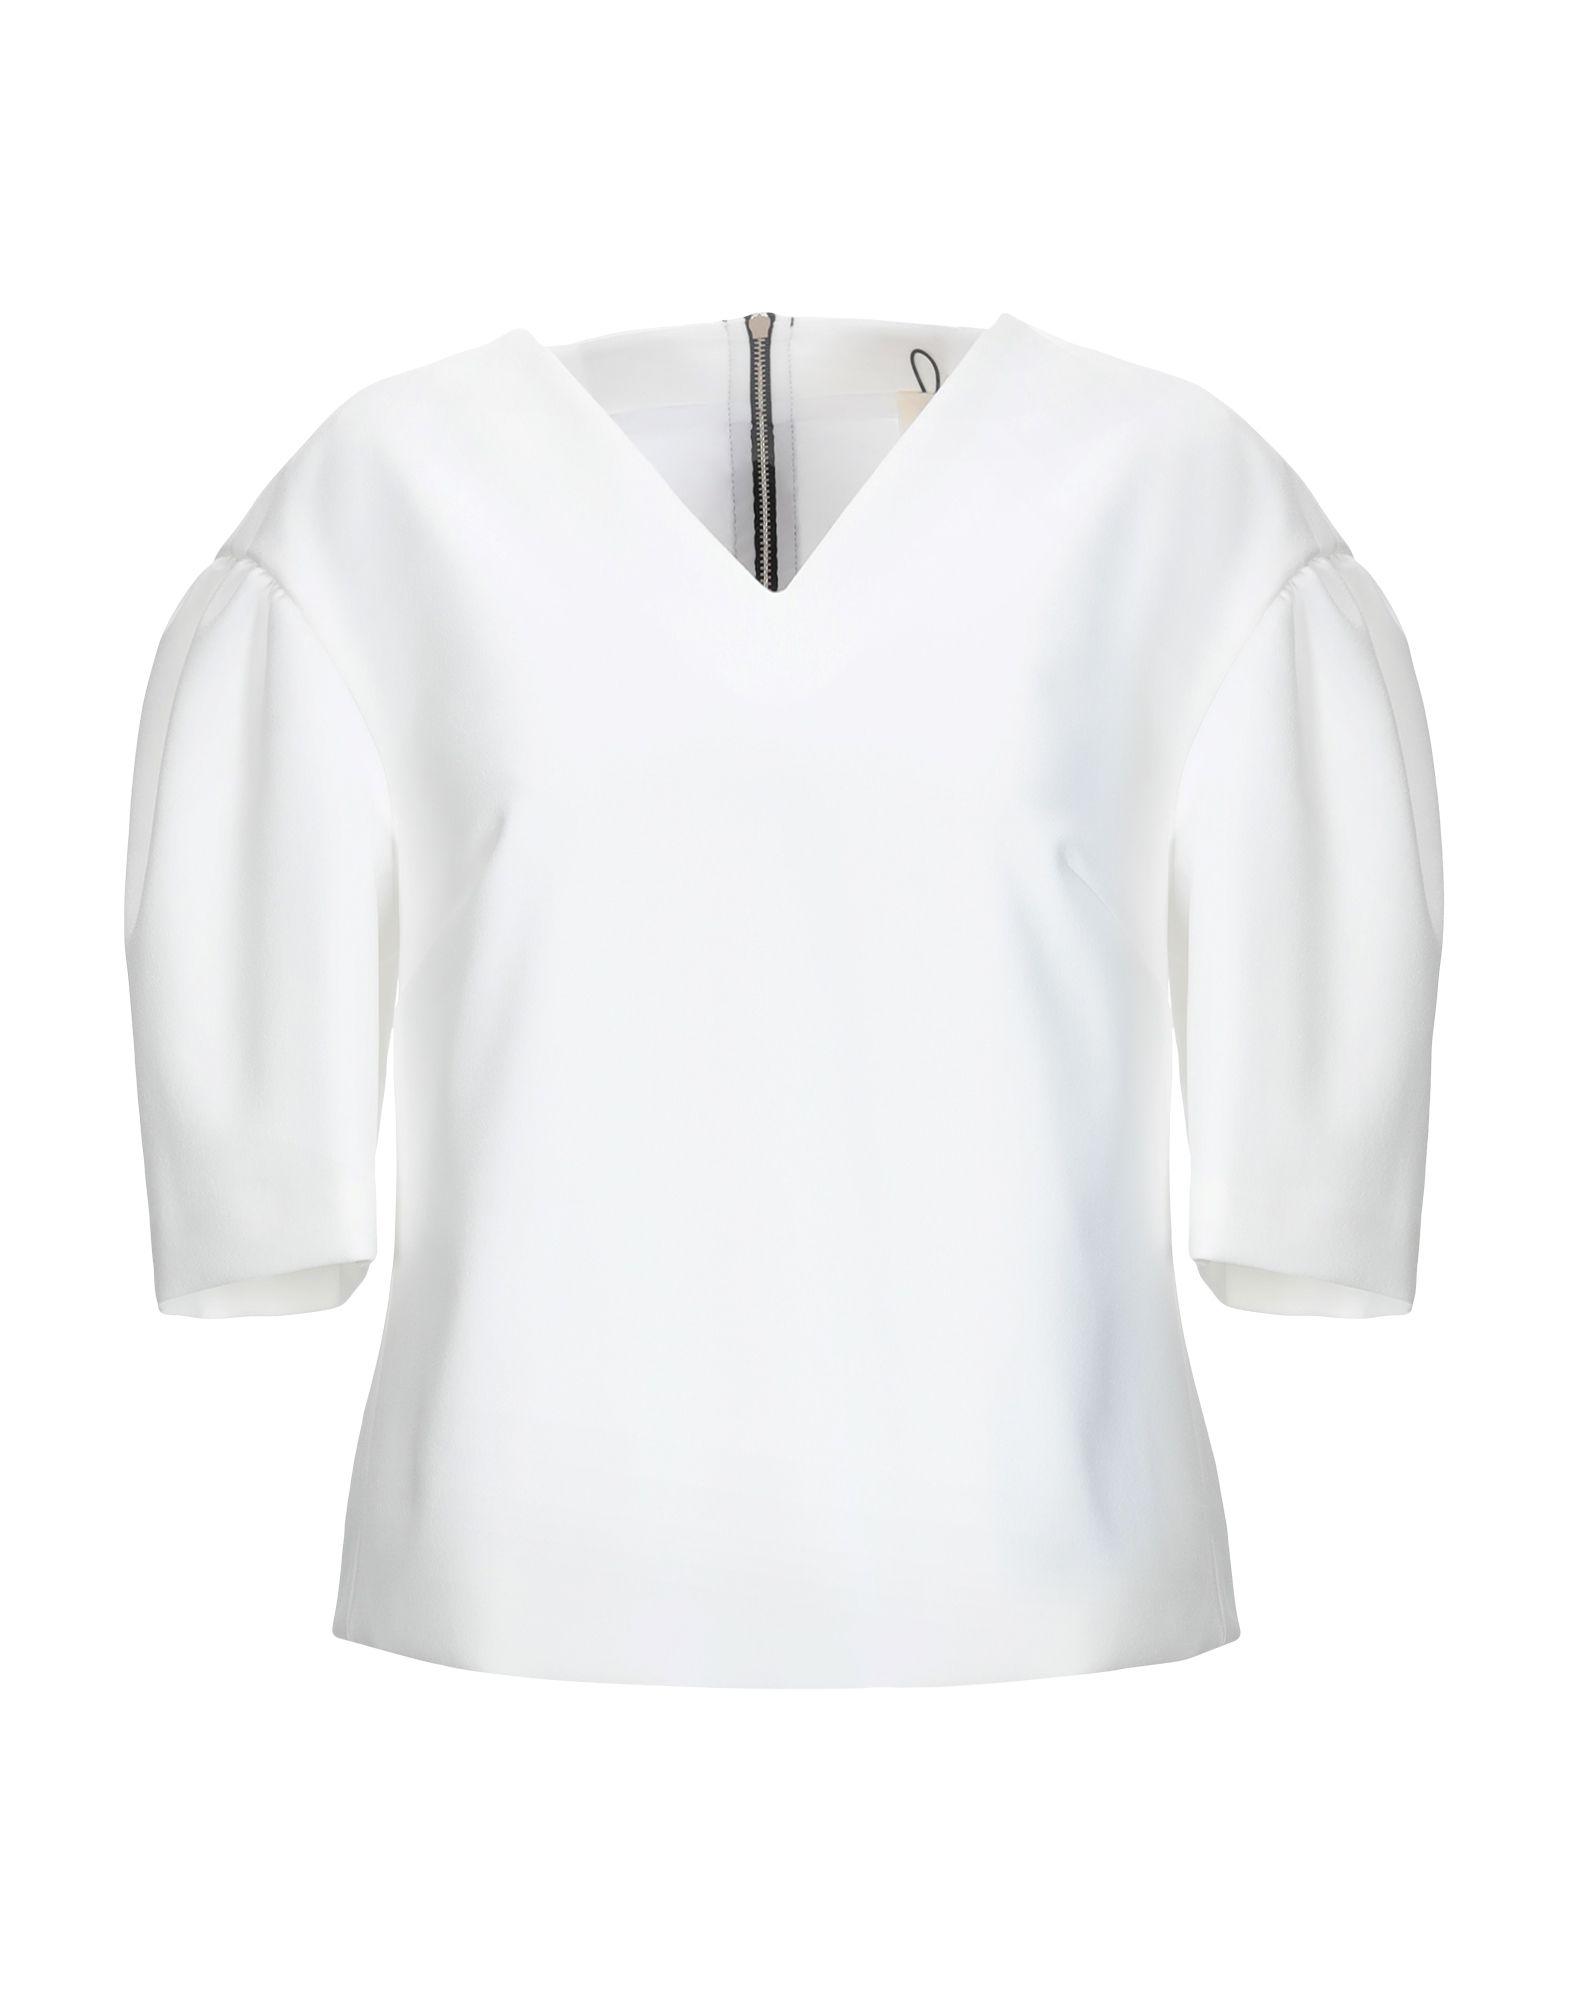 ANNIE P. Блузка annie p блузка